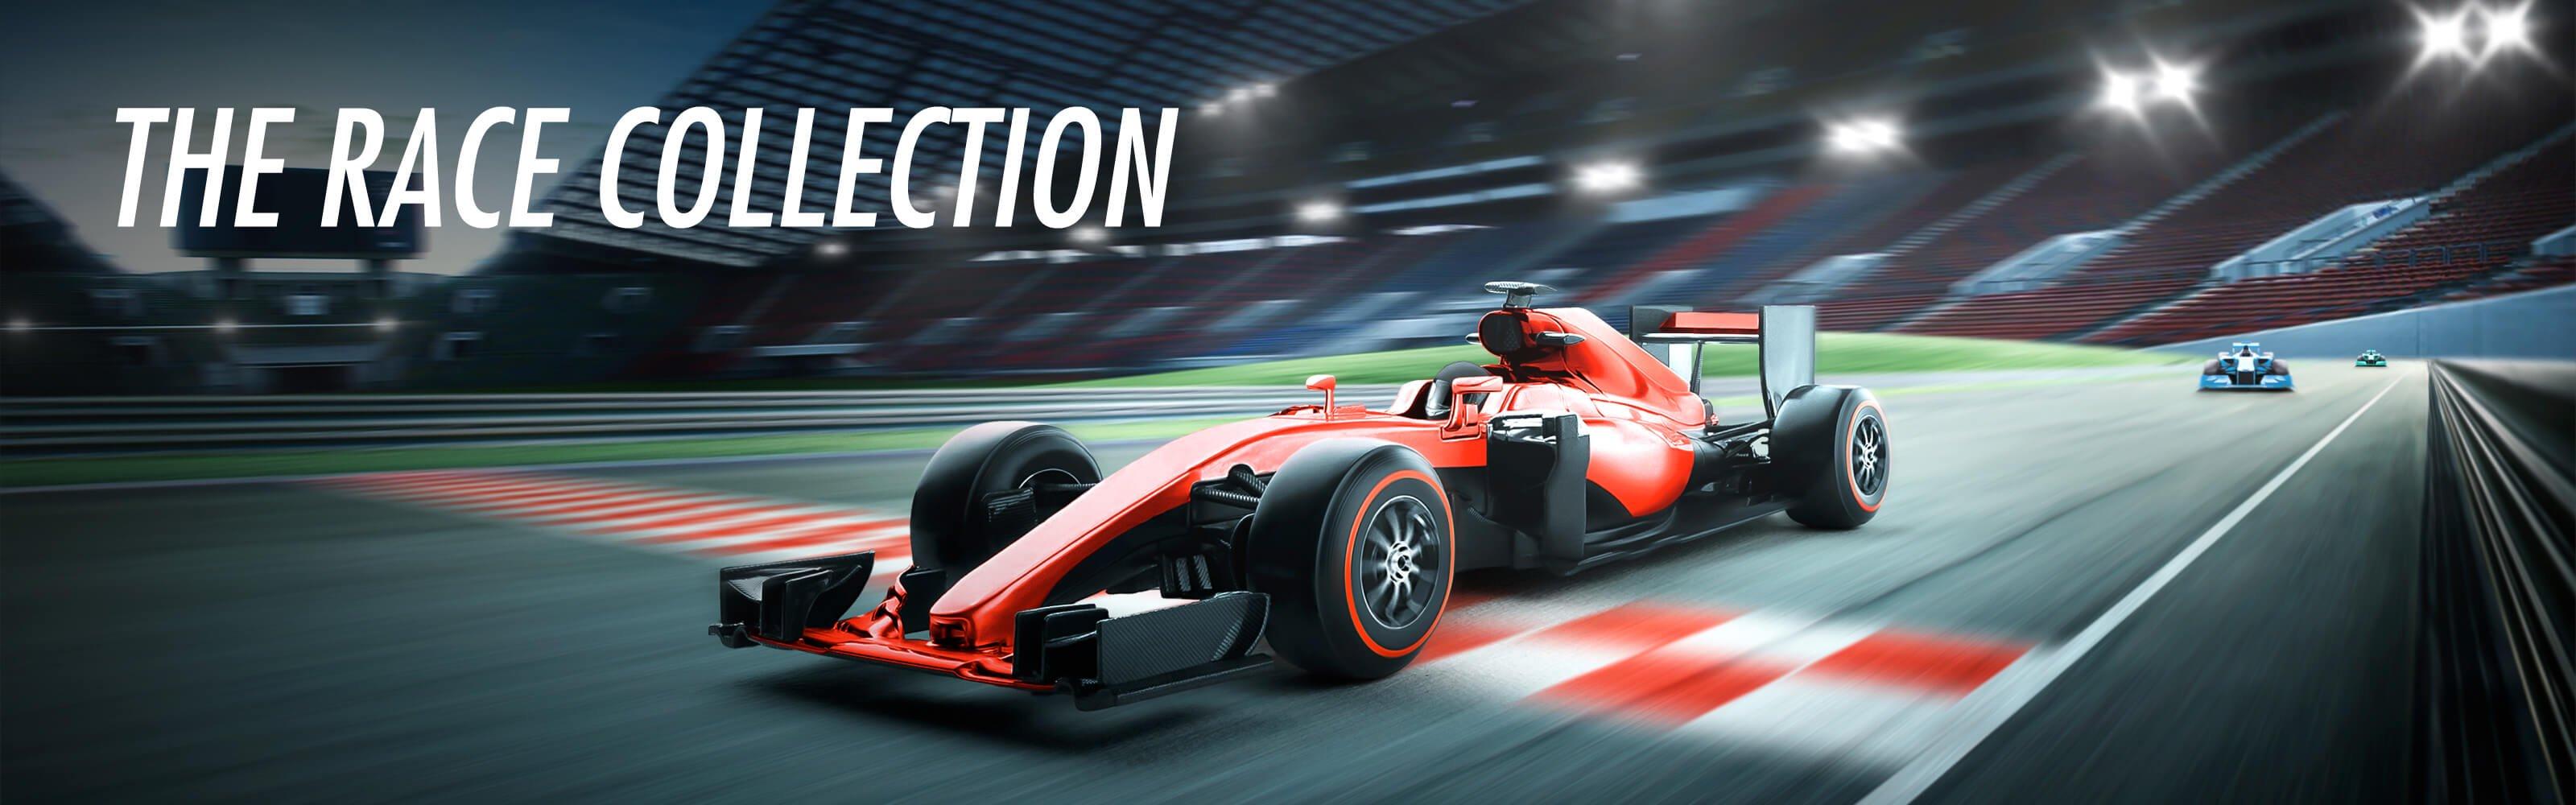 The Race Collection @ KrisShop